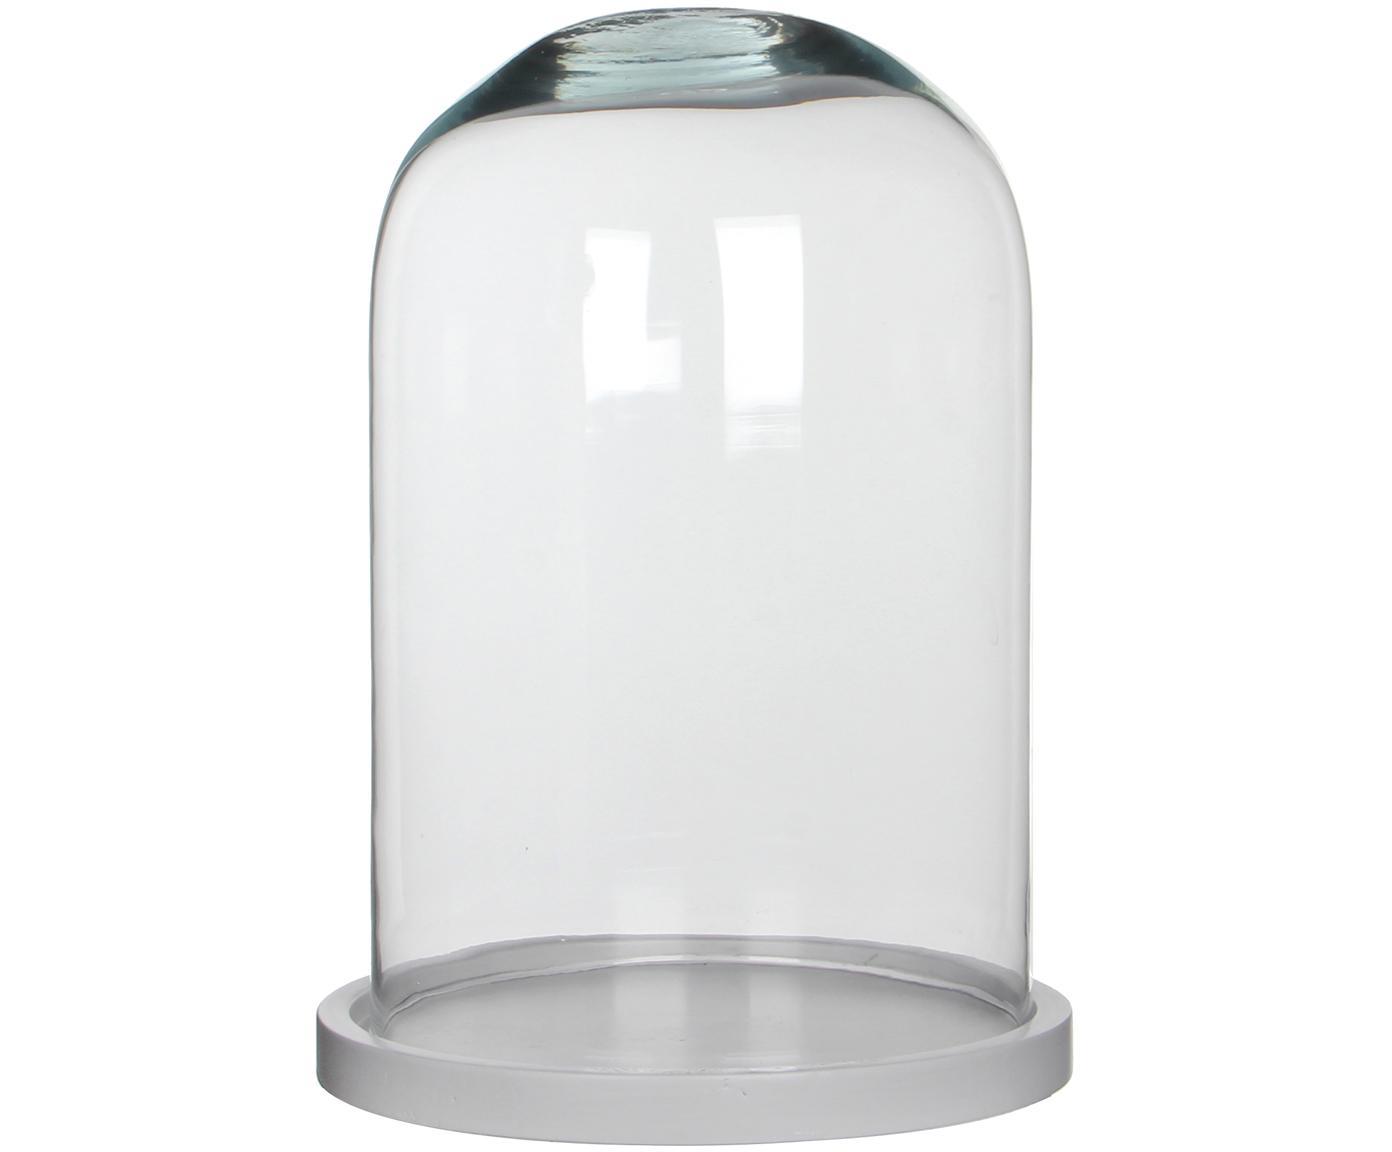 Campana Hella, Urna: vidrio, Urna: transparente Base: blanco, Ø 22 x Al 30 cm